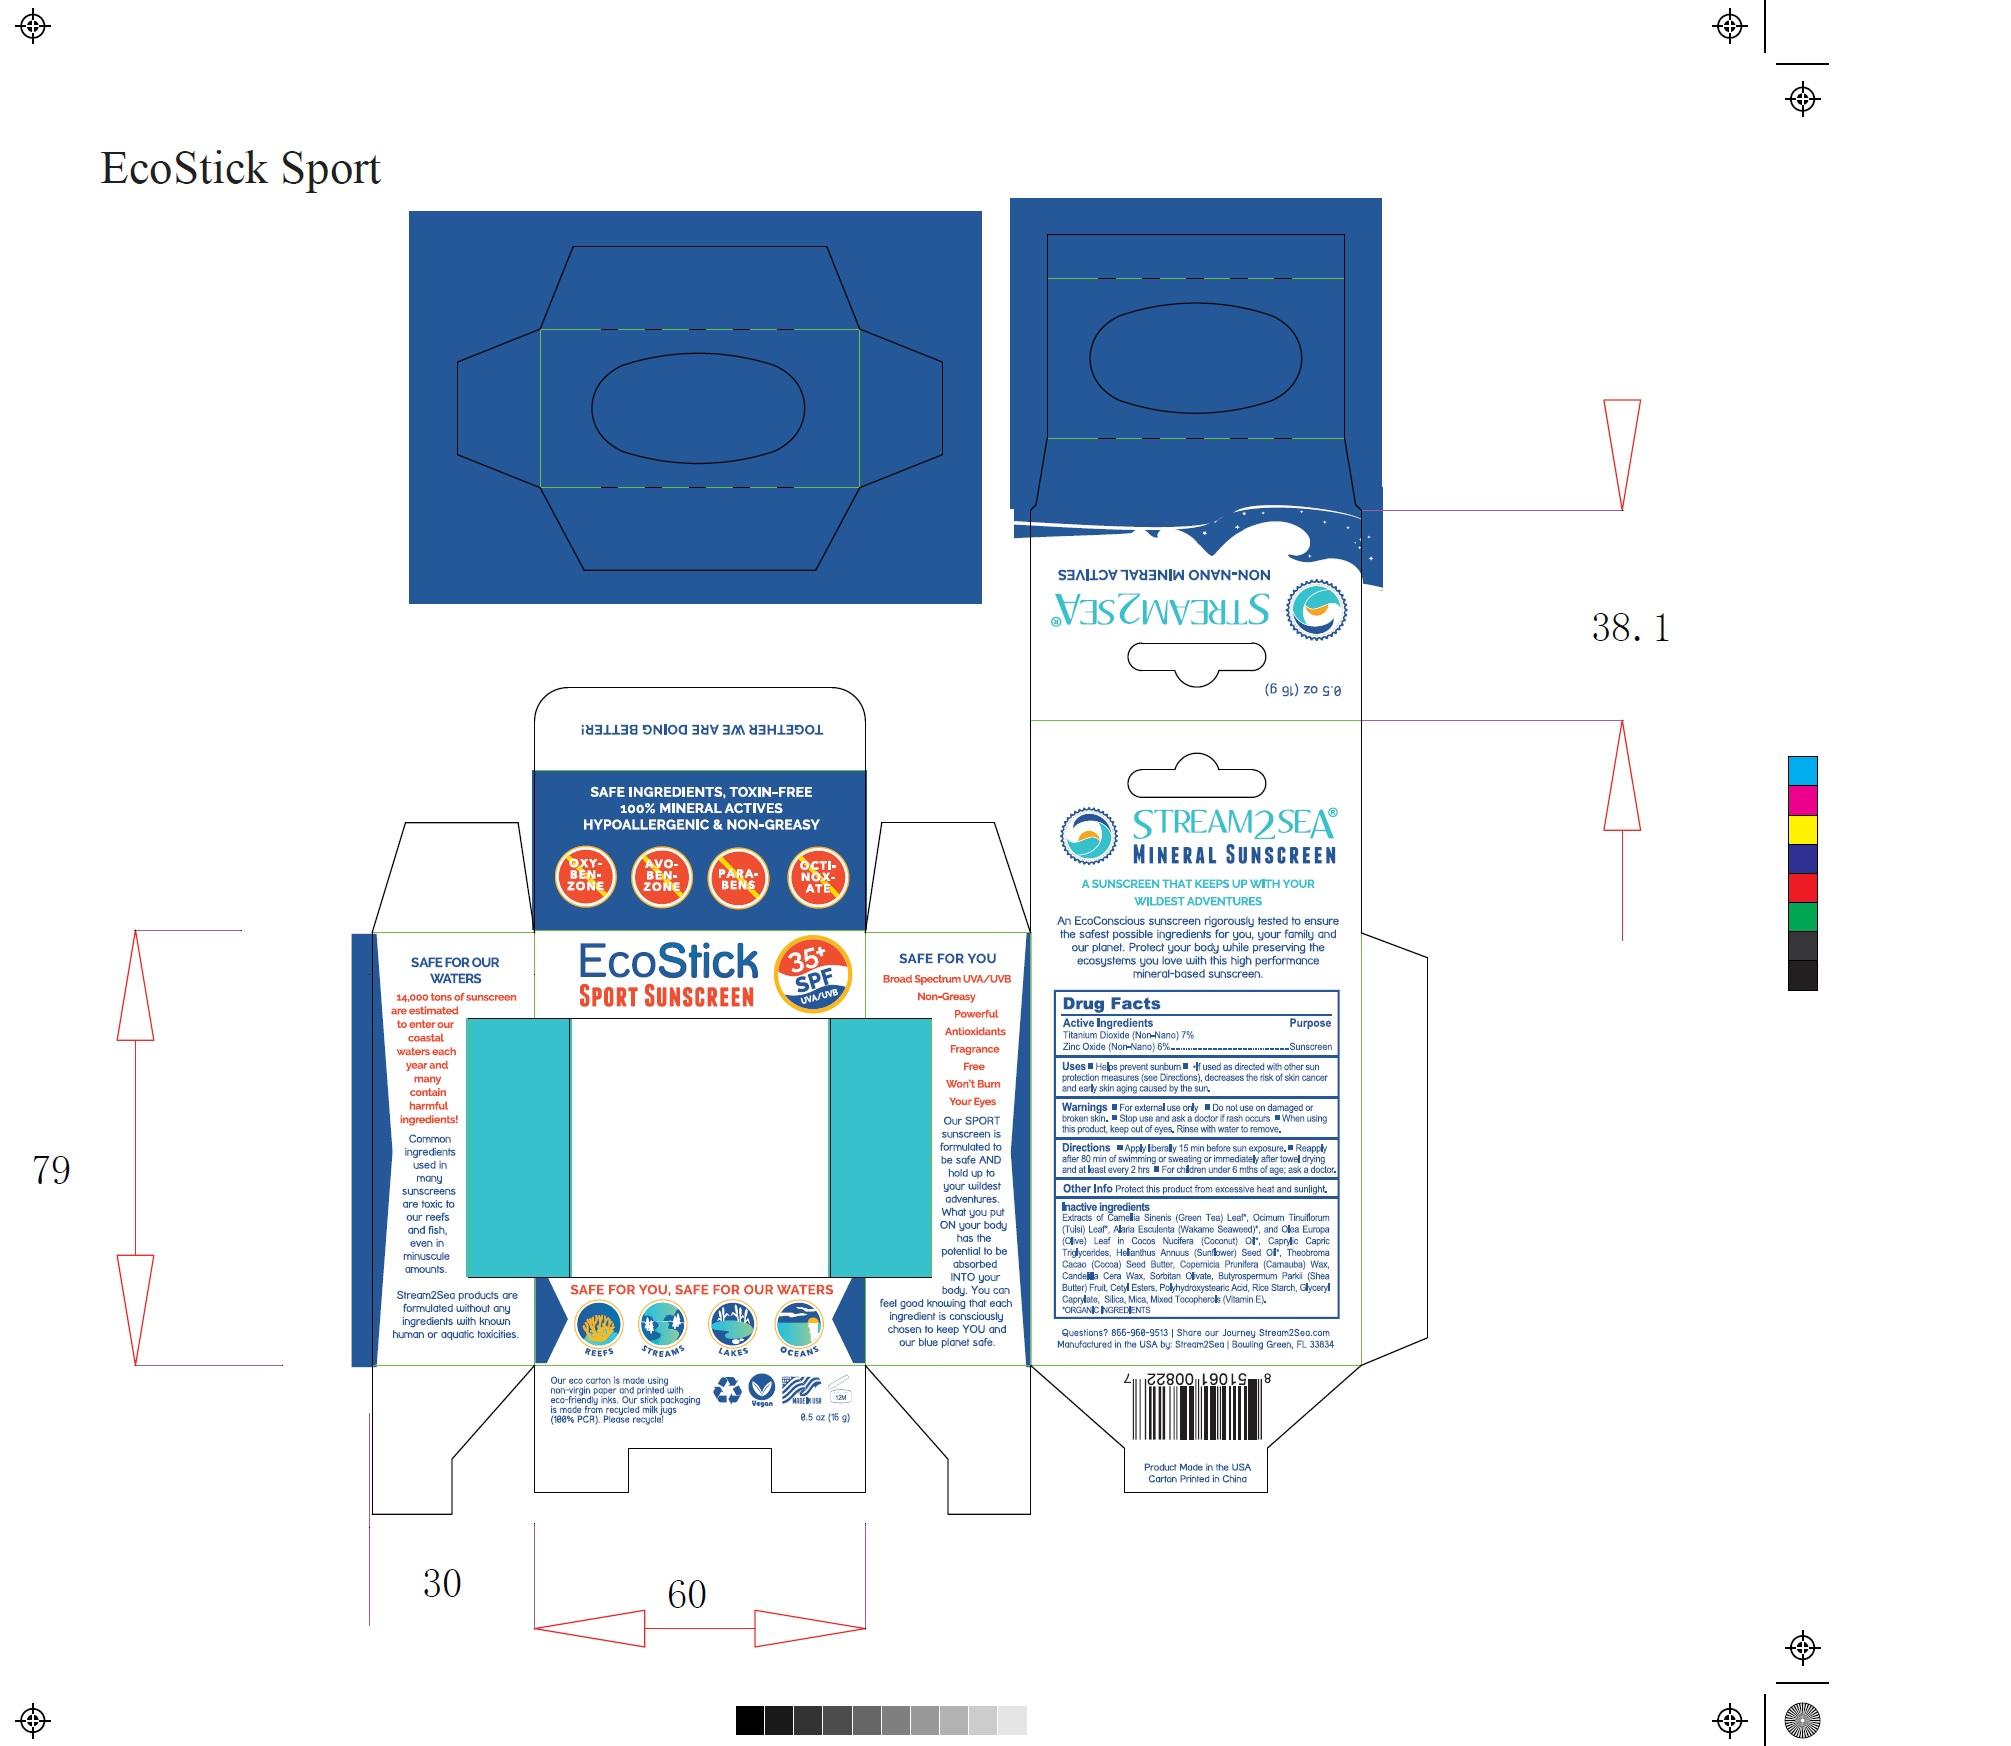 EcoStick Sport Screenscreen Wild Blue Carton Label